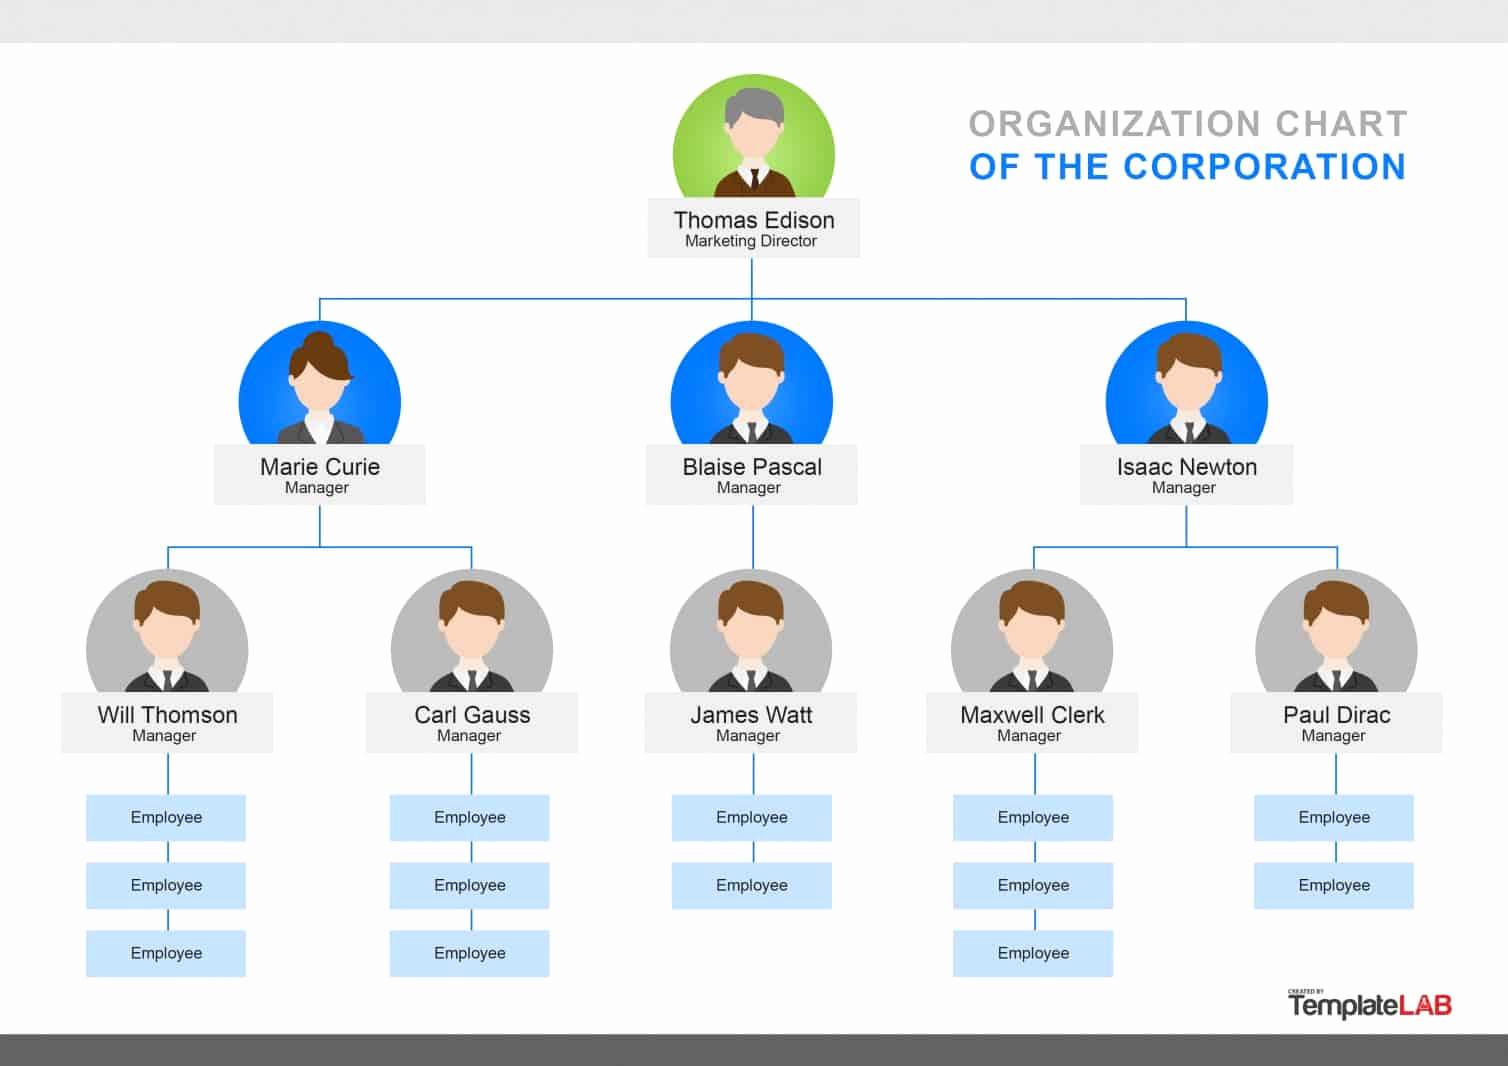 Organizational Chart Template Free Lovely 40 organizational Chart Templates Word Excel Powerpoint